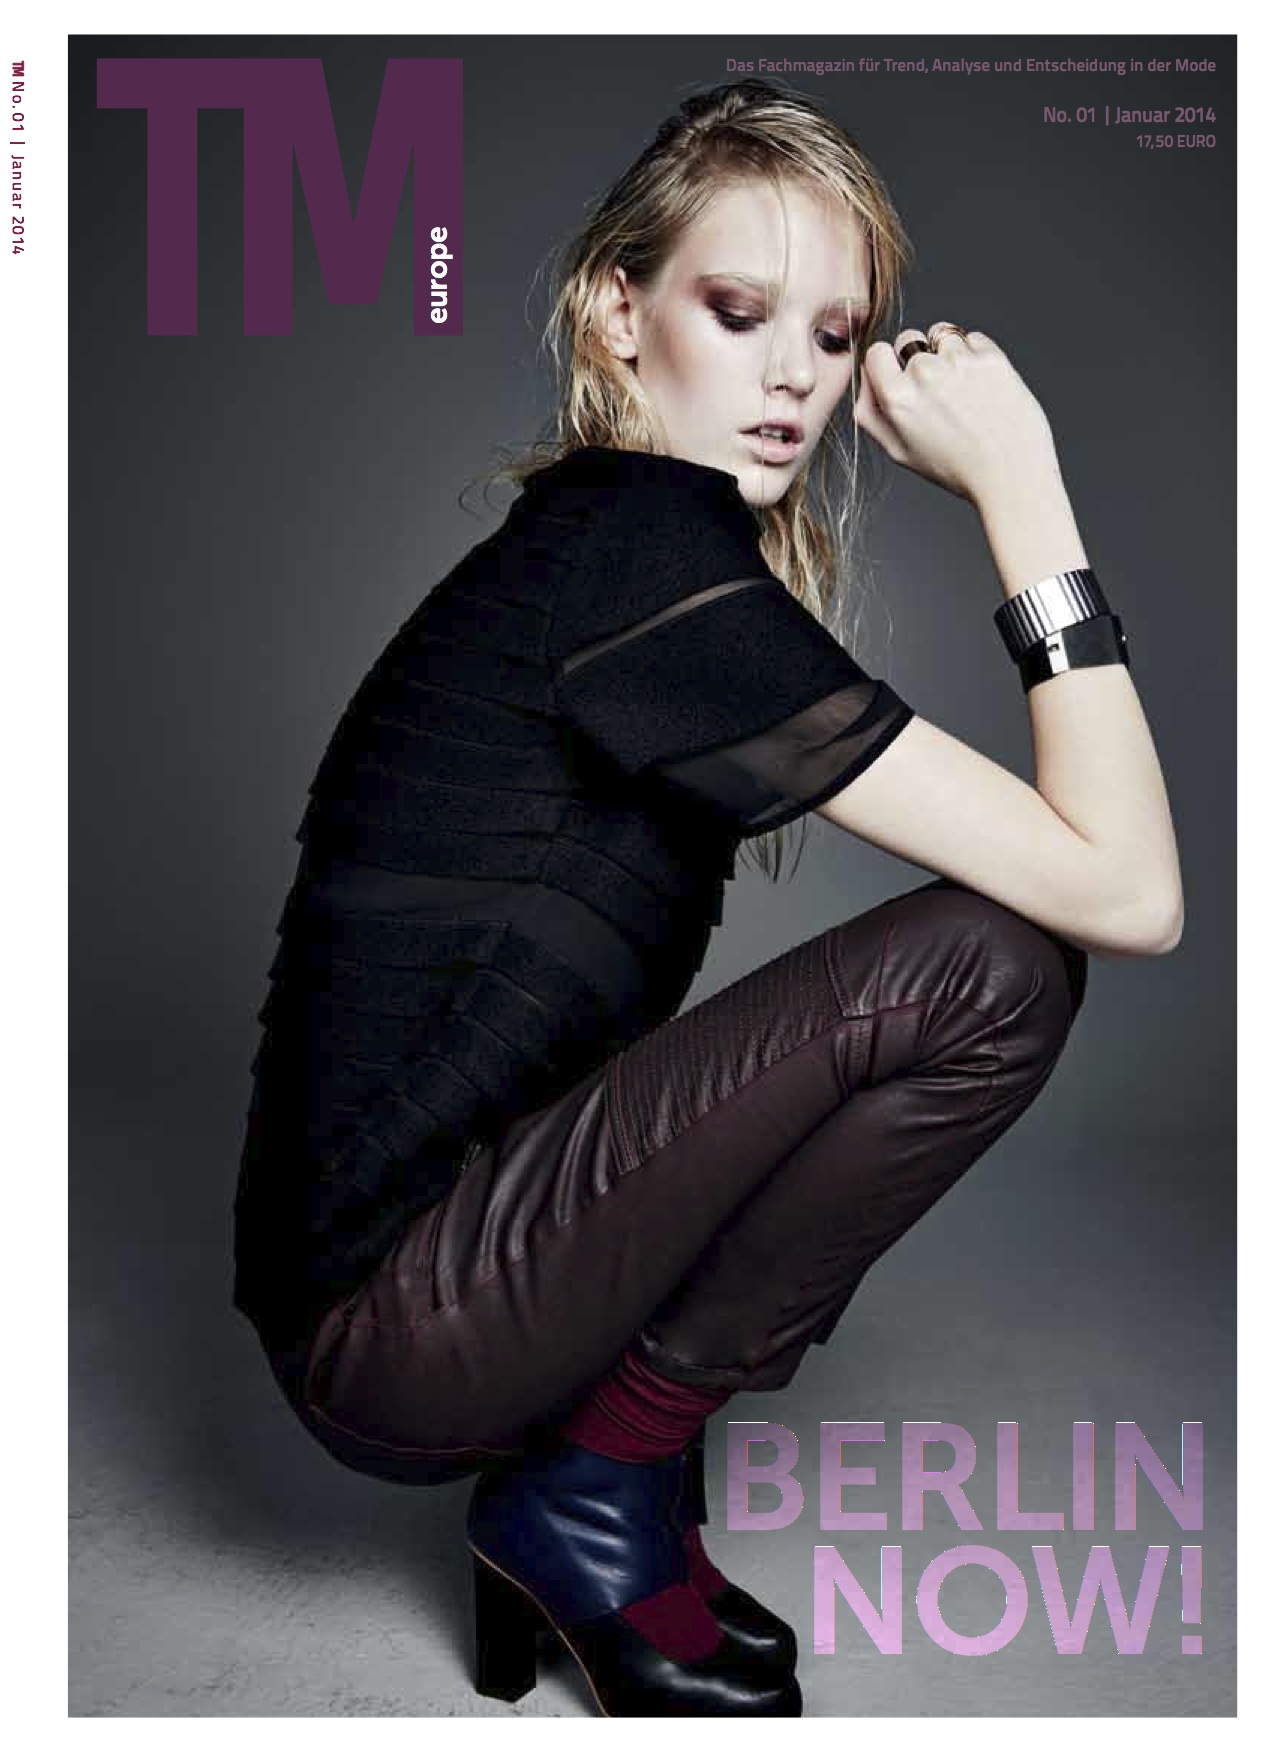 2014 Stehmann Titelseite TM europe Berlin Kopie .jpg